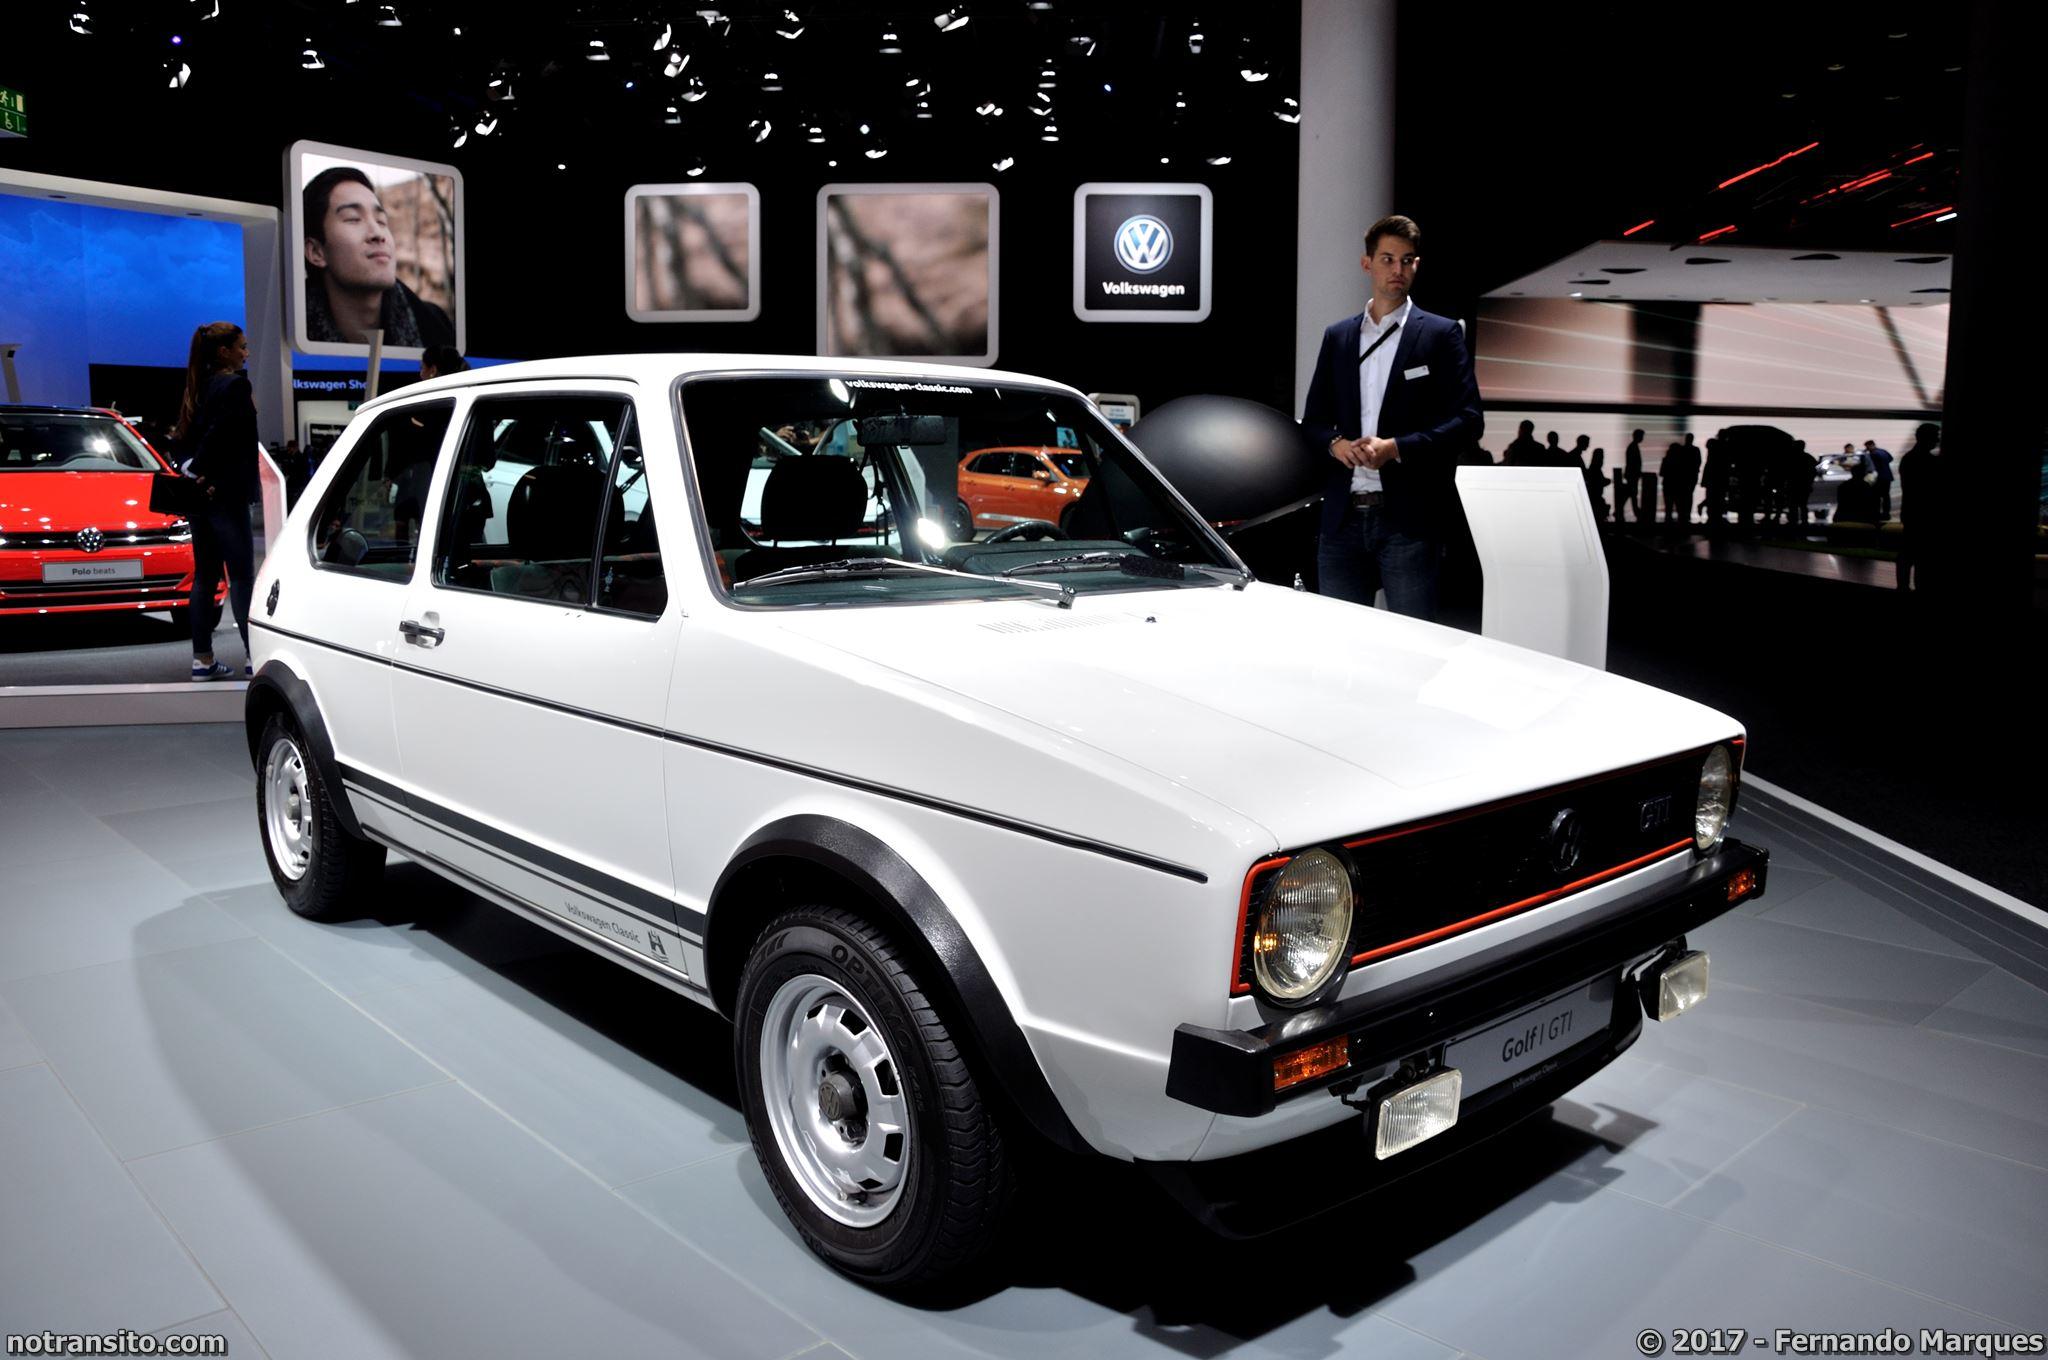 Volkswagen-Golf-GTI-Frankfurt-2017-003